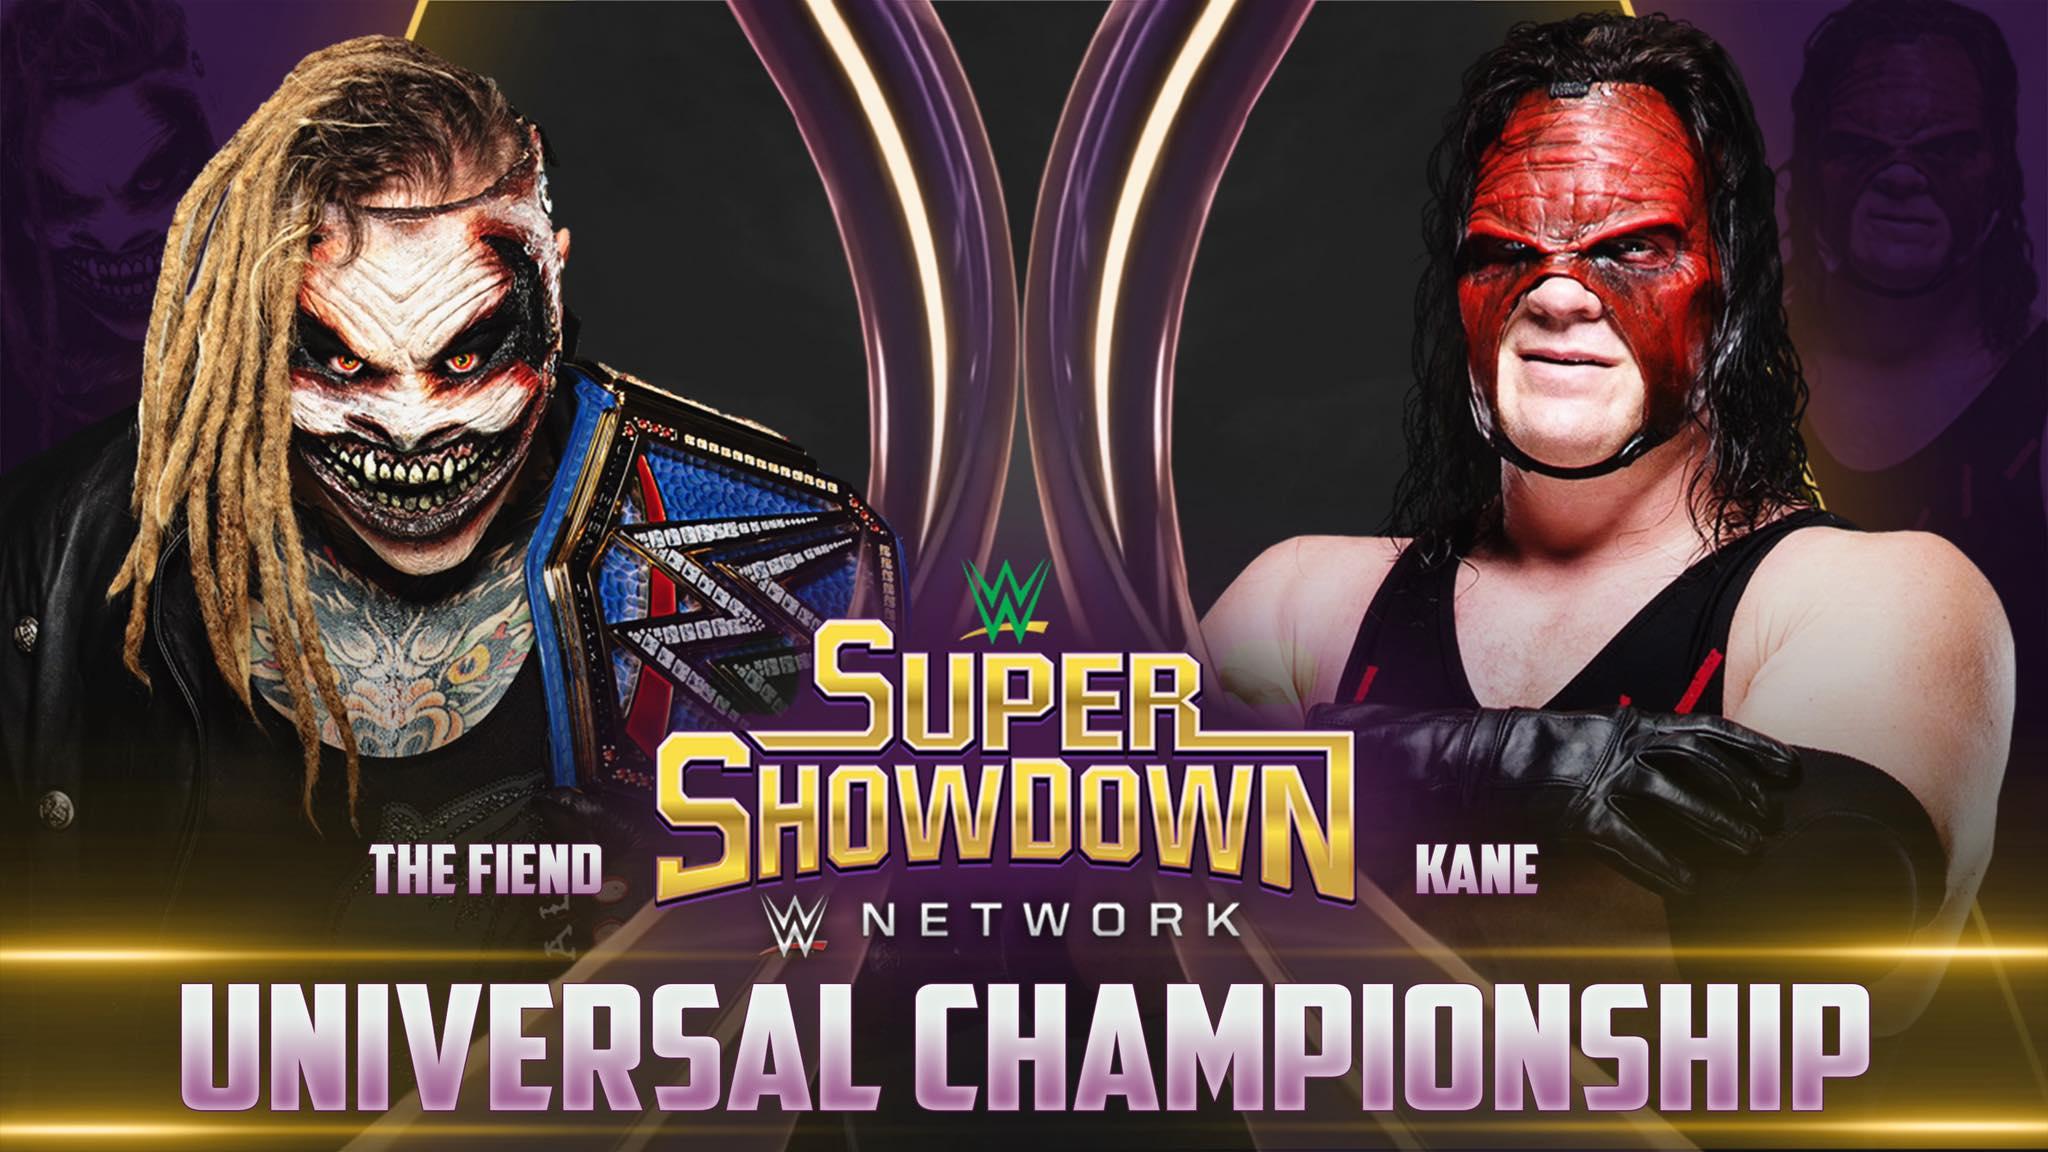 The Fiend vs Kane - Universal Championship Match (WWE Super ShowDown 2020)